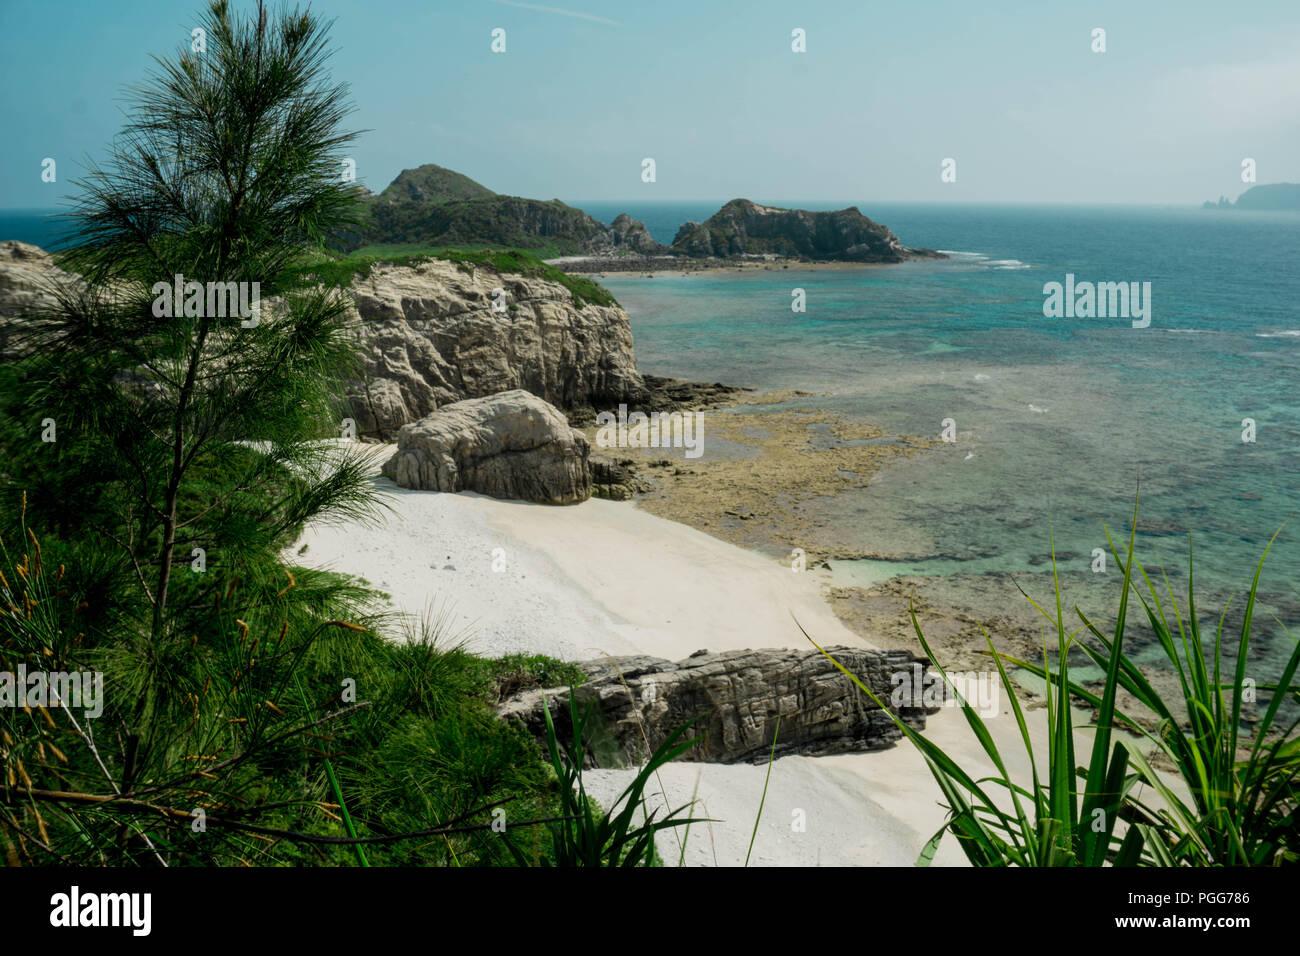 Insel Akajima, Okinawa - Stock Image